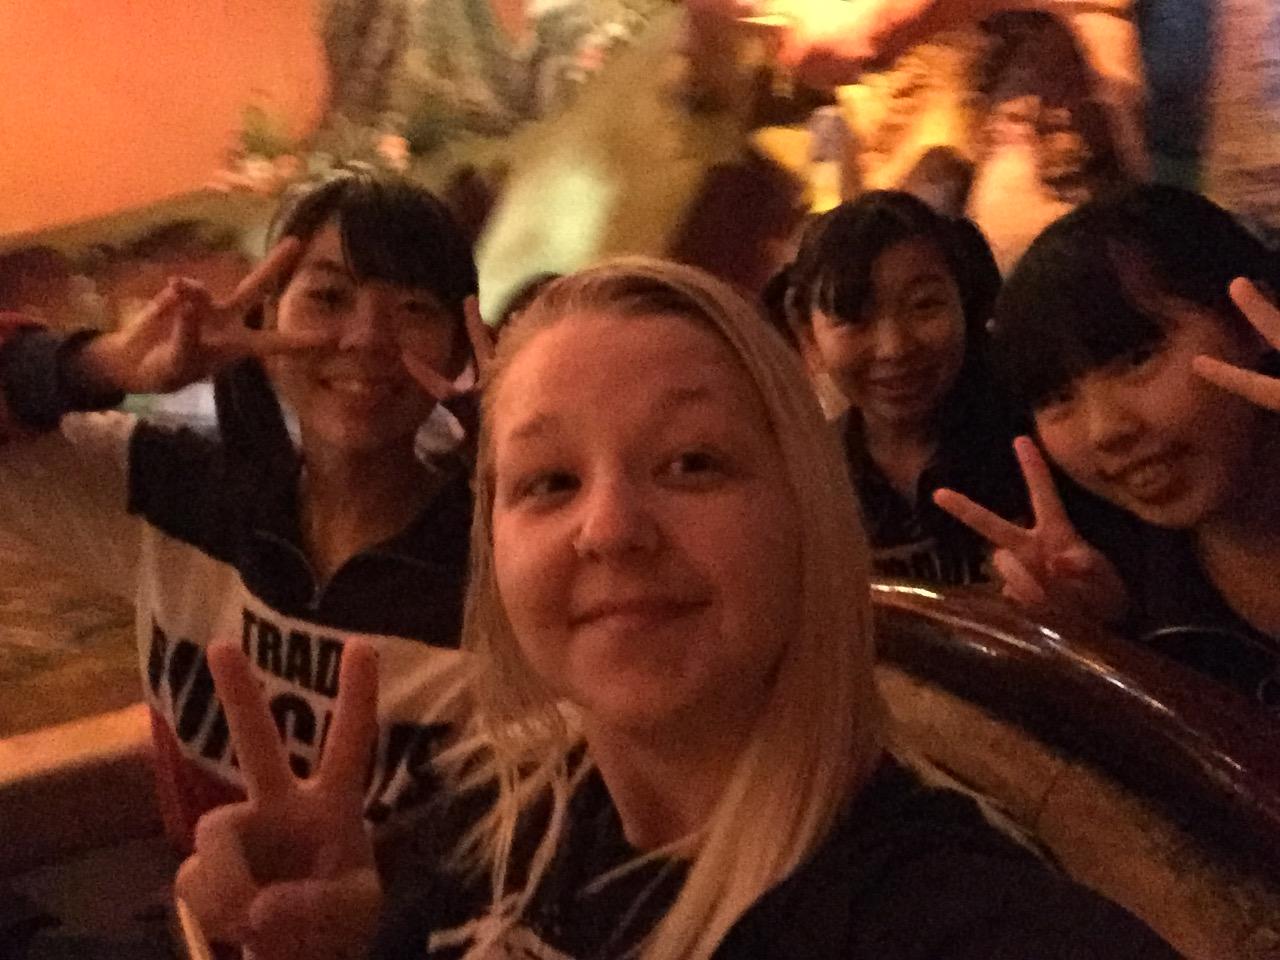 Gemma at Disneyland Tokyo on Splash Mountain